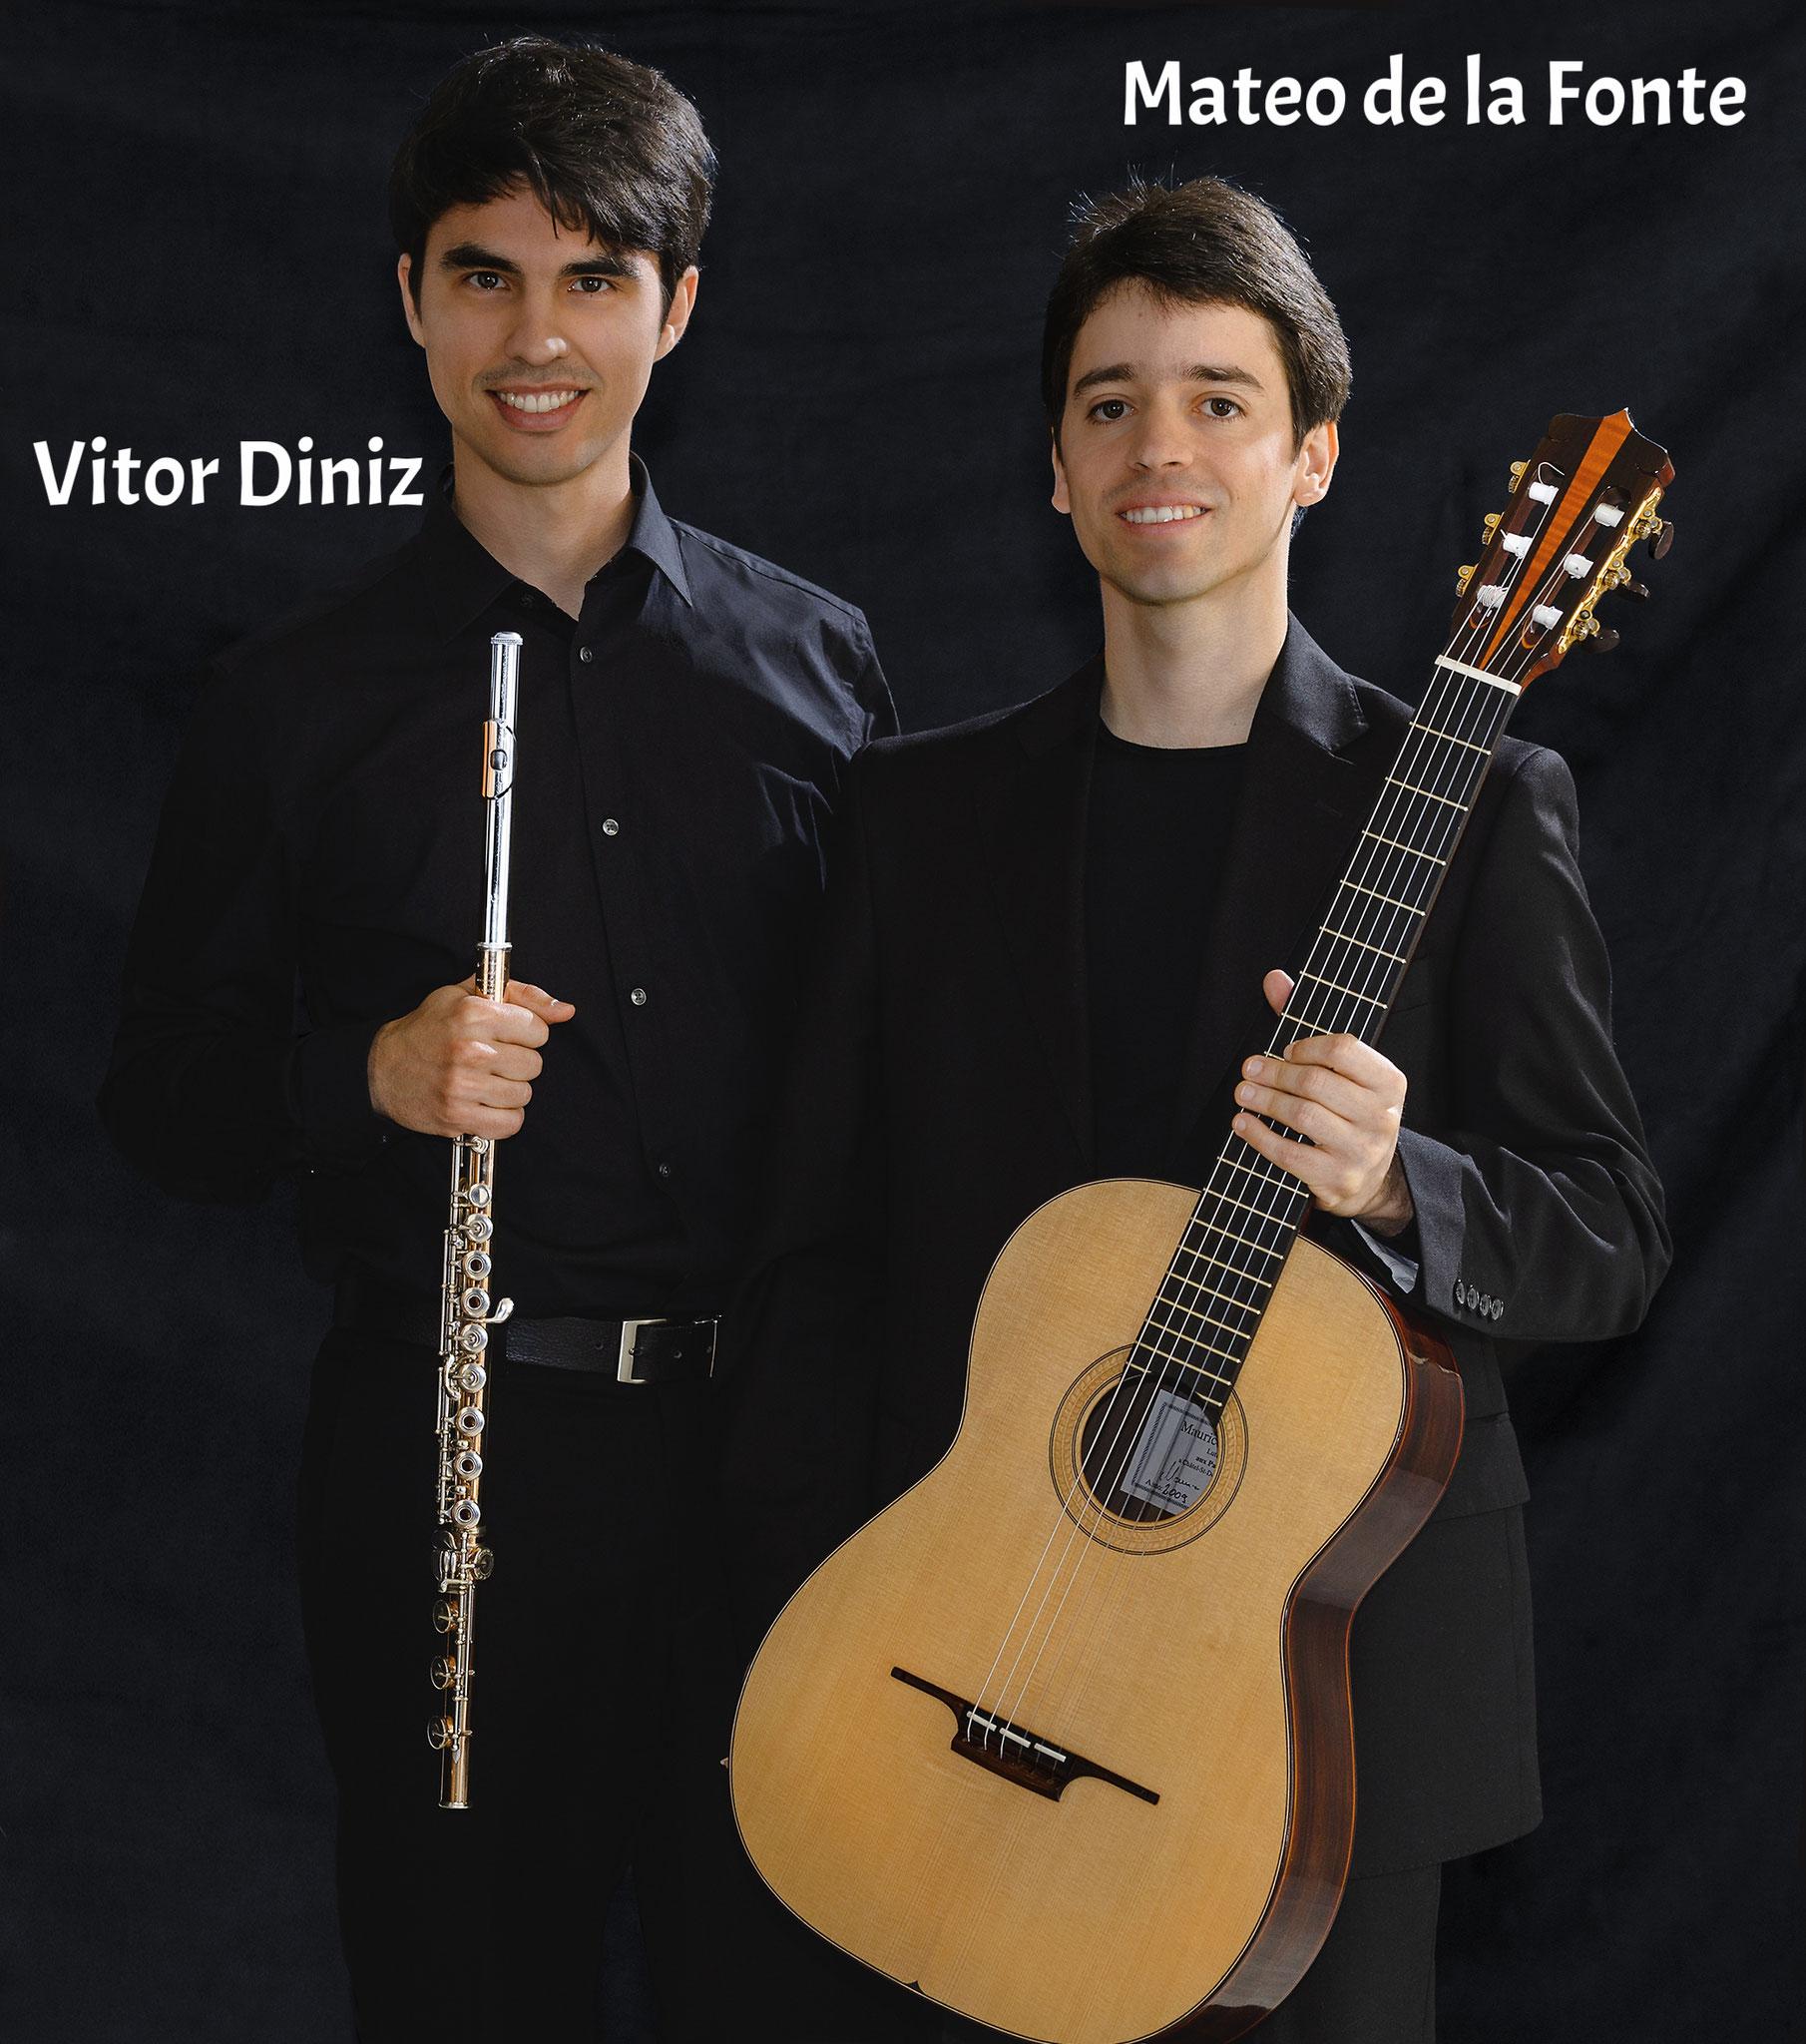 http://www.mateusdelafonte.com/